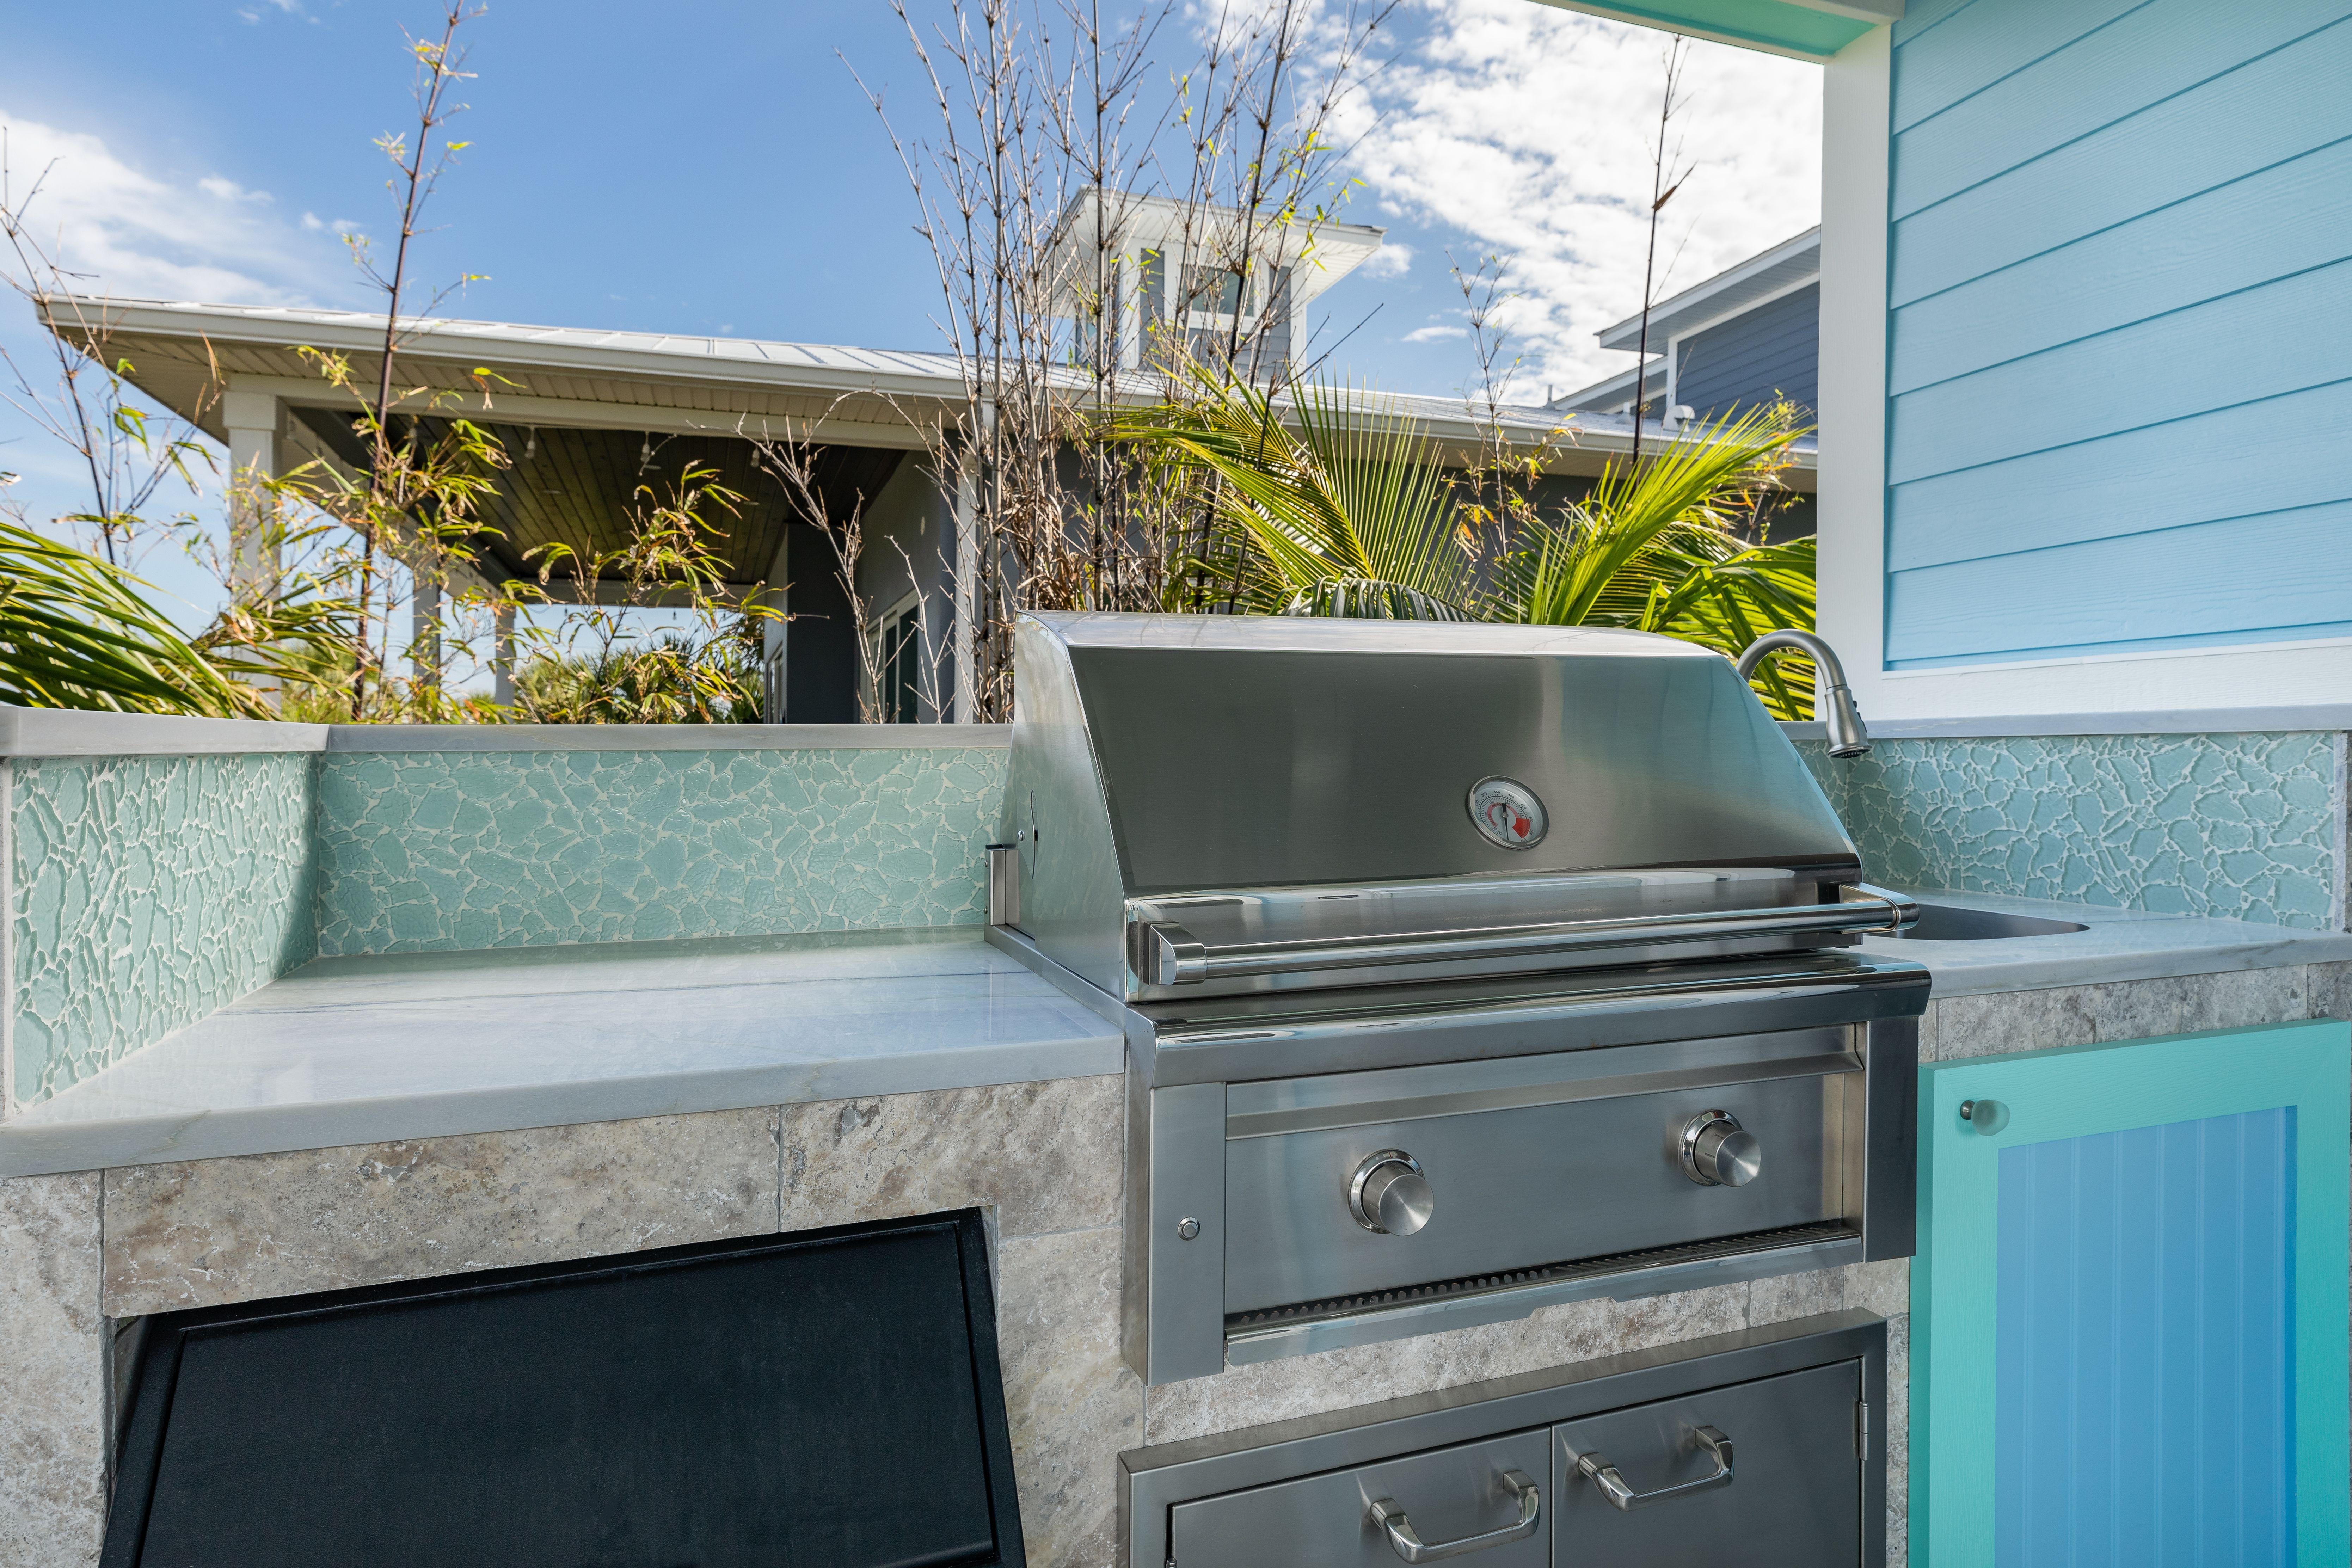 River Puzzle Installs Outdoor Kitchen Installation Outdoor